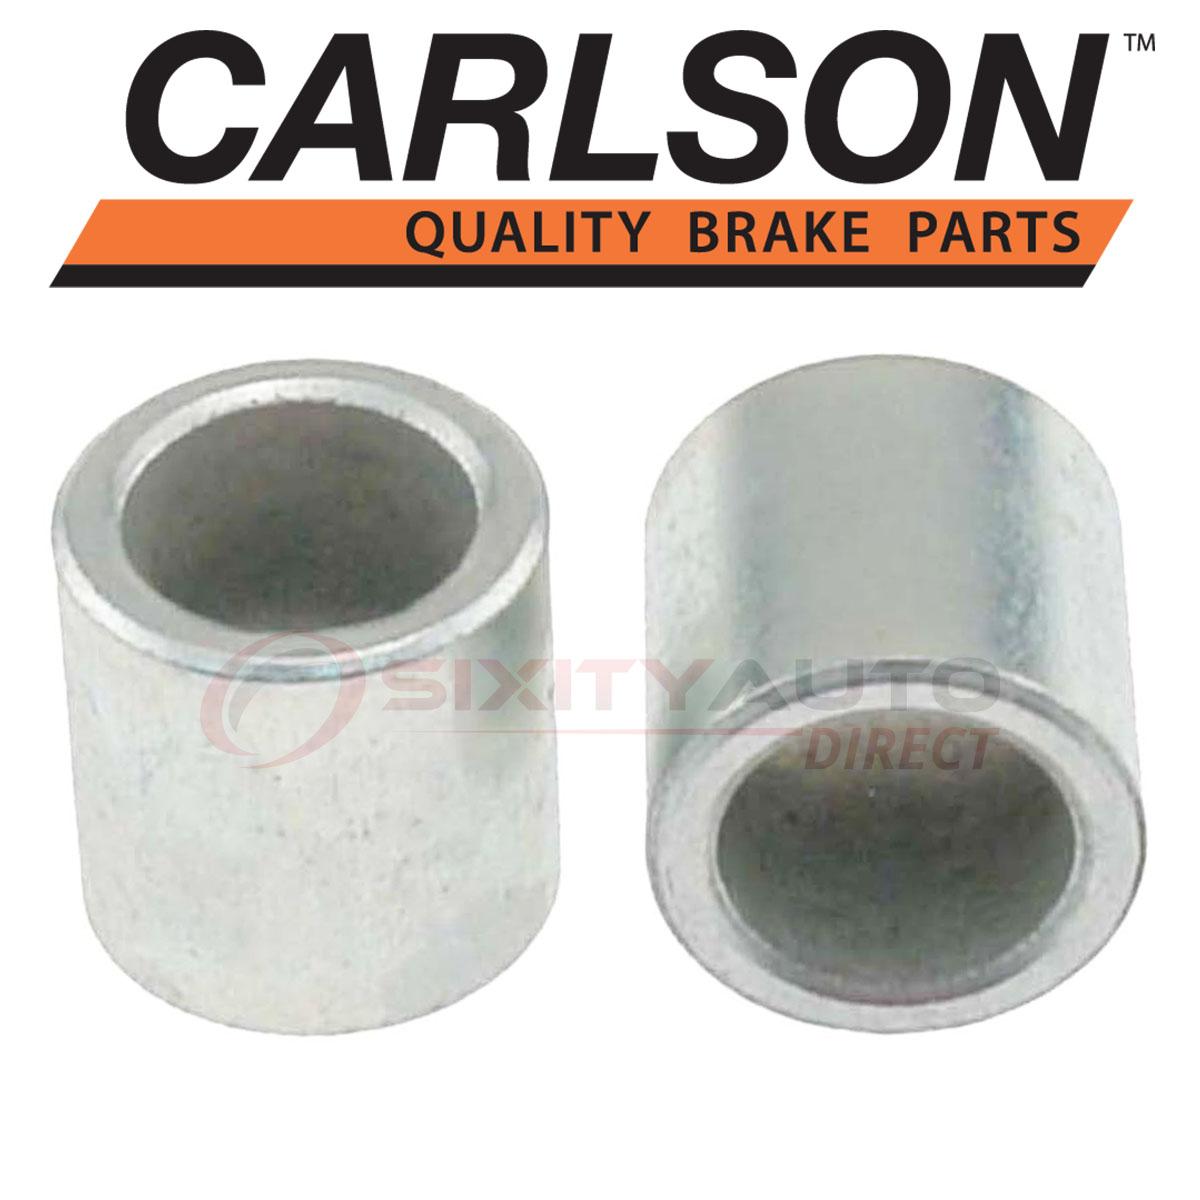 Carlson Quality Brake Parts 14168 Disc Brake Guide Pin Set